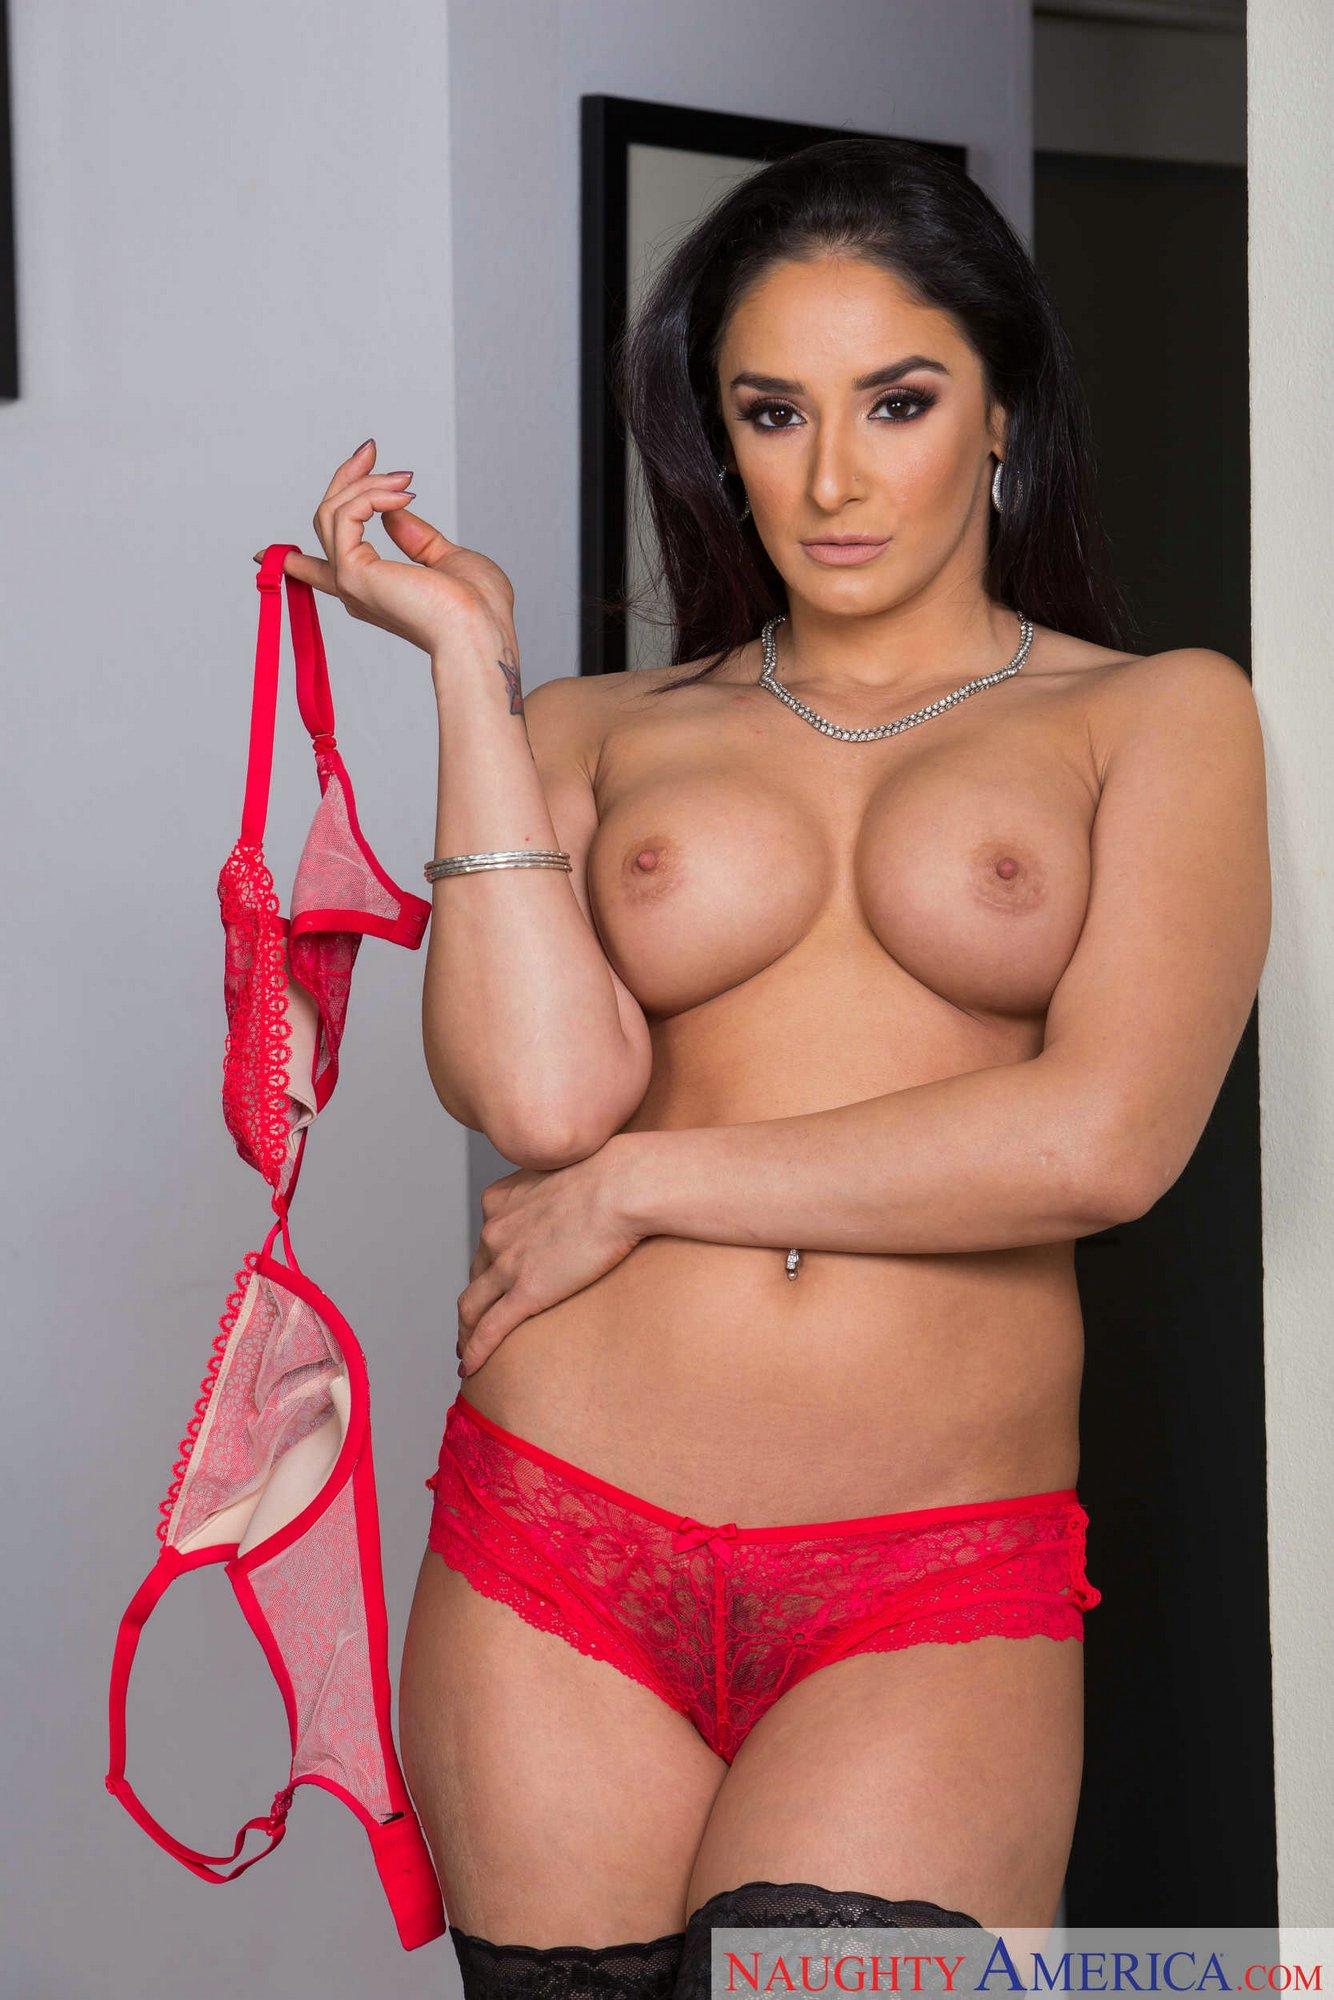 Sheena Ryder Pornos & Sexfilme Kostenlos - FRAUPORNO